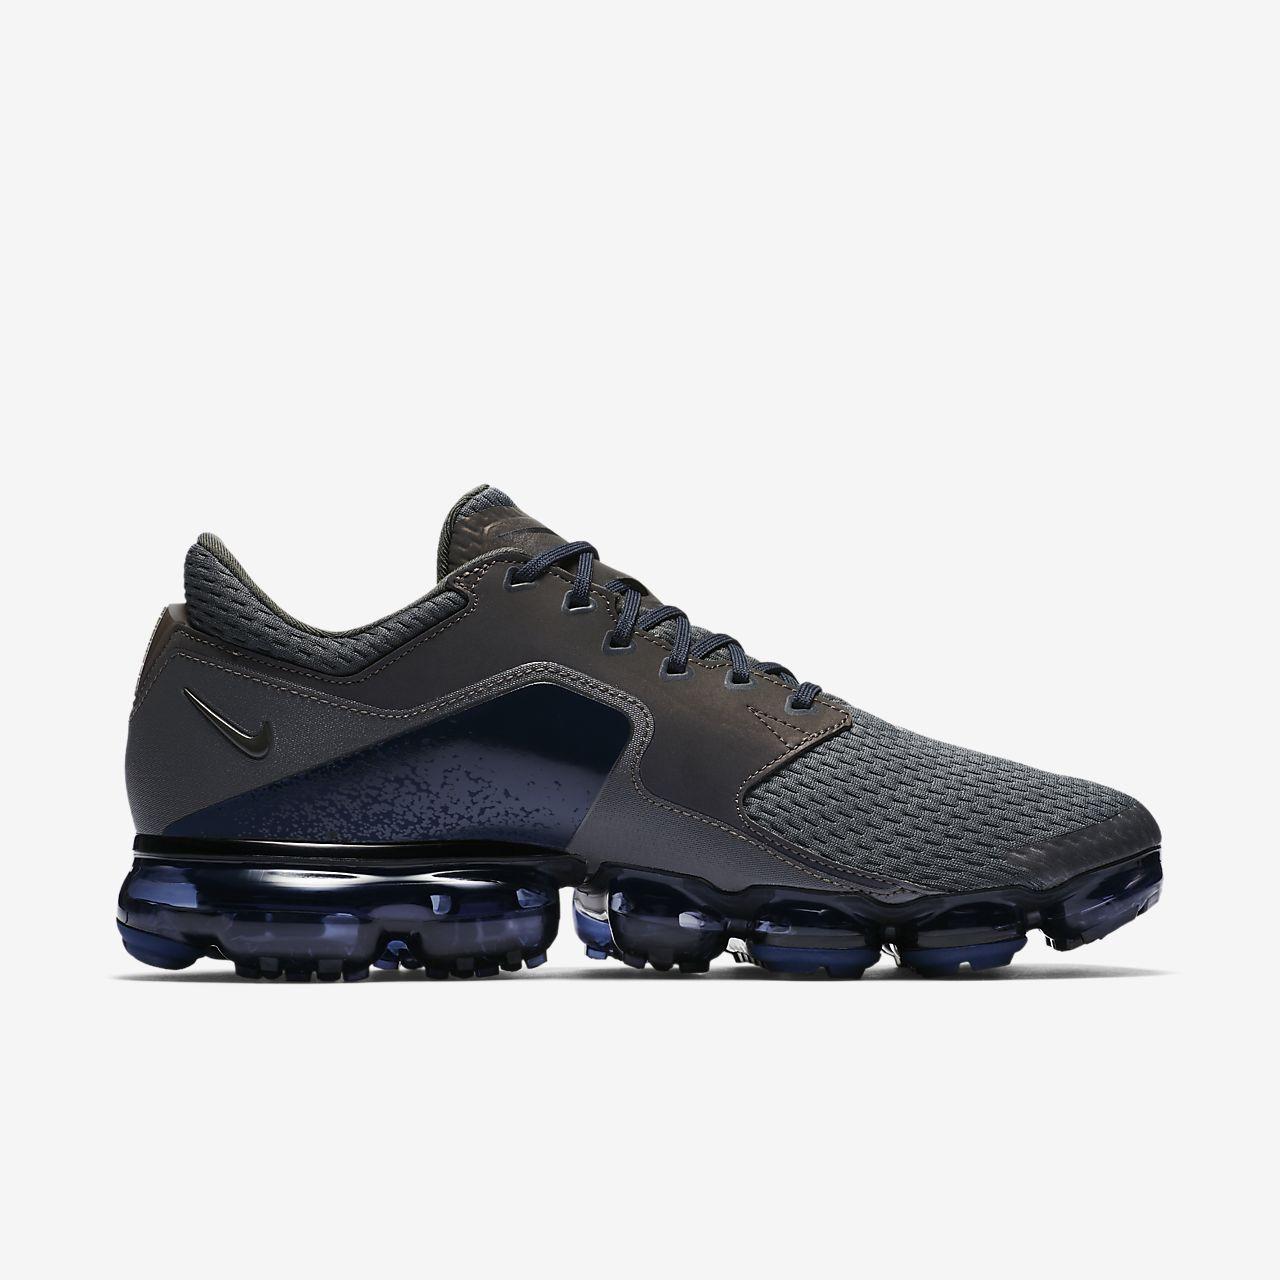 b98a0174bdf37 Mens Nike Air Vapormax biological-crop-protection.co.uk